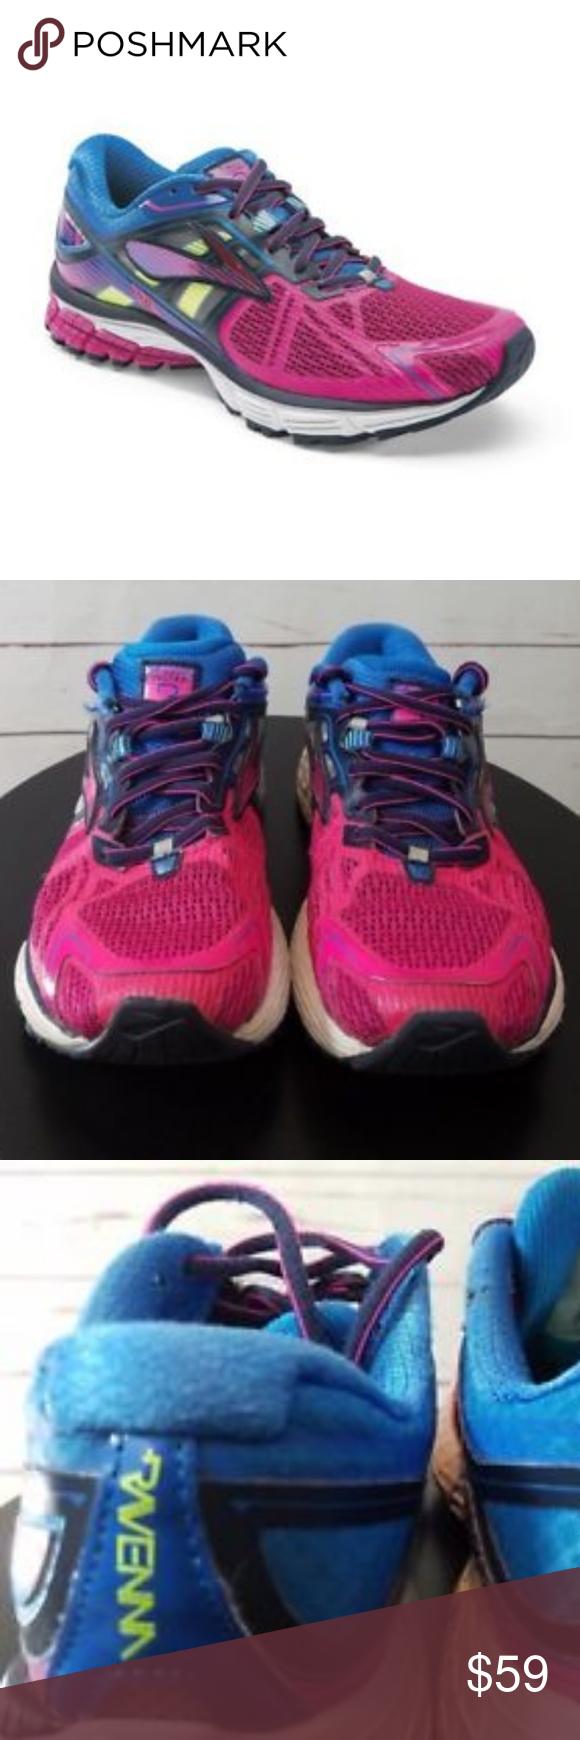 2568a706731 Brooks Ravenna 6 DNA Size 8 Womens Brooks Ravenna 6 Women s Running Shoes  Ride that fine